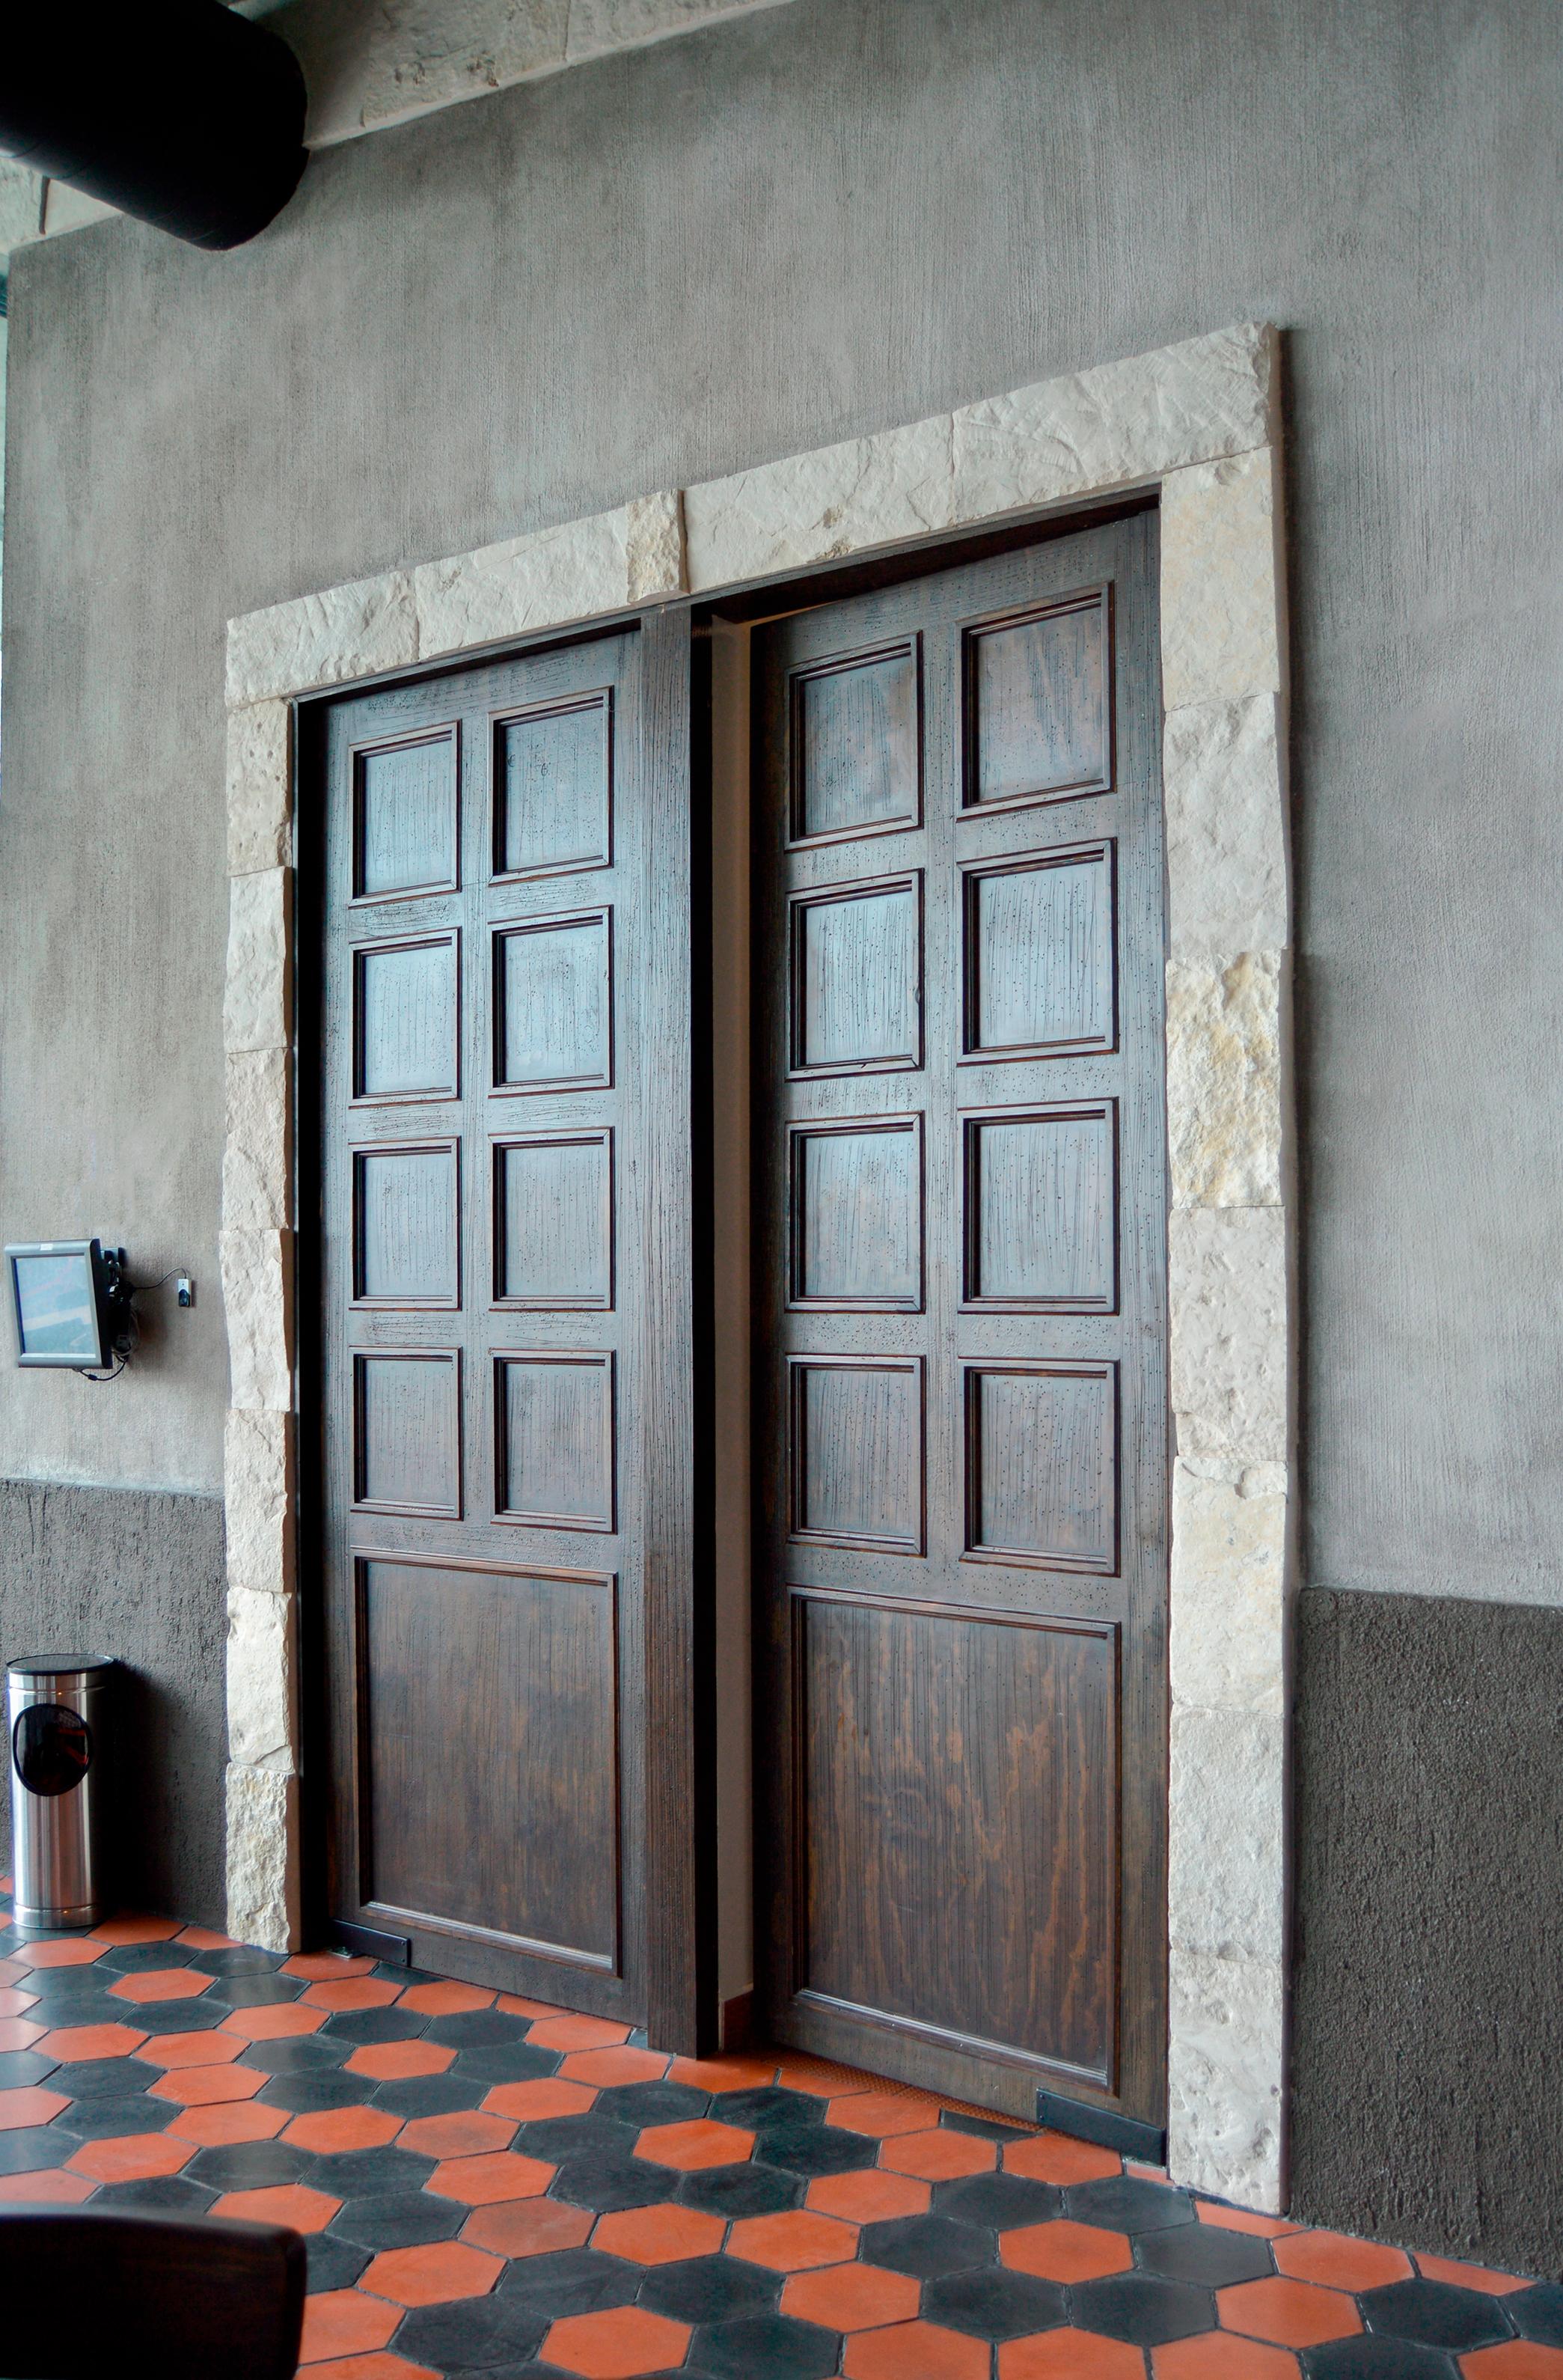 Puertas de Cocina en Madera de Pino